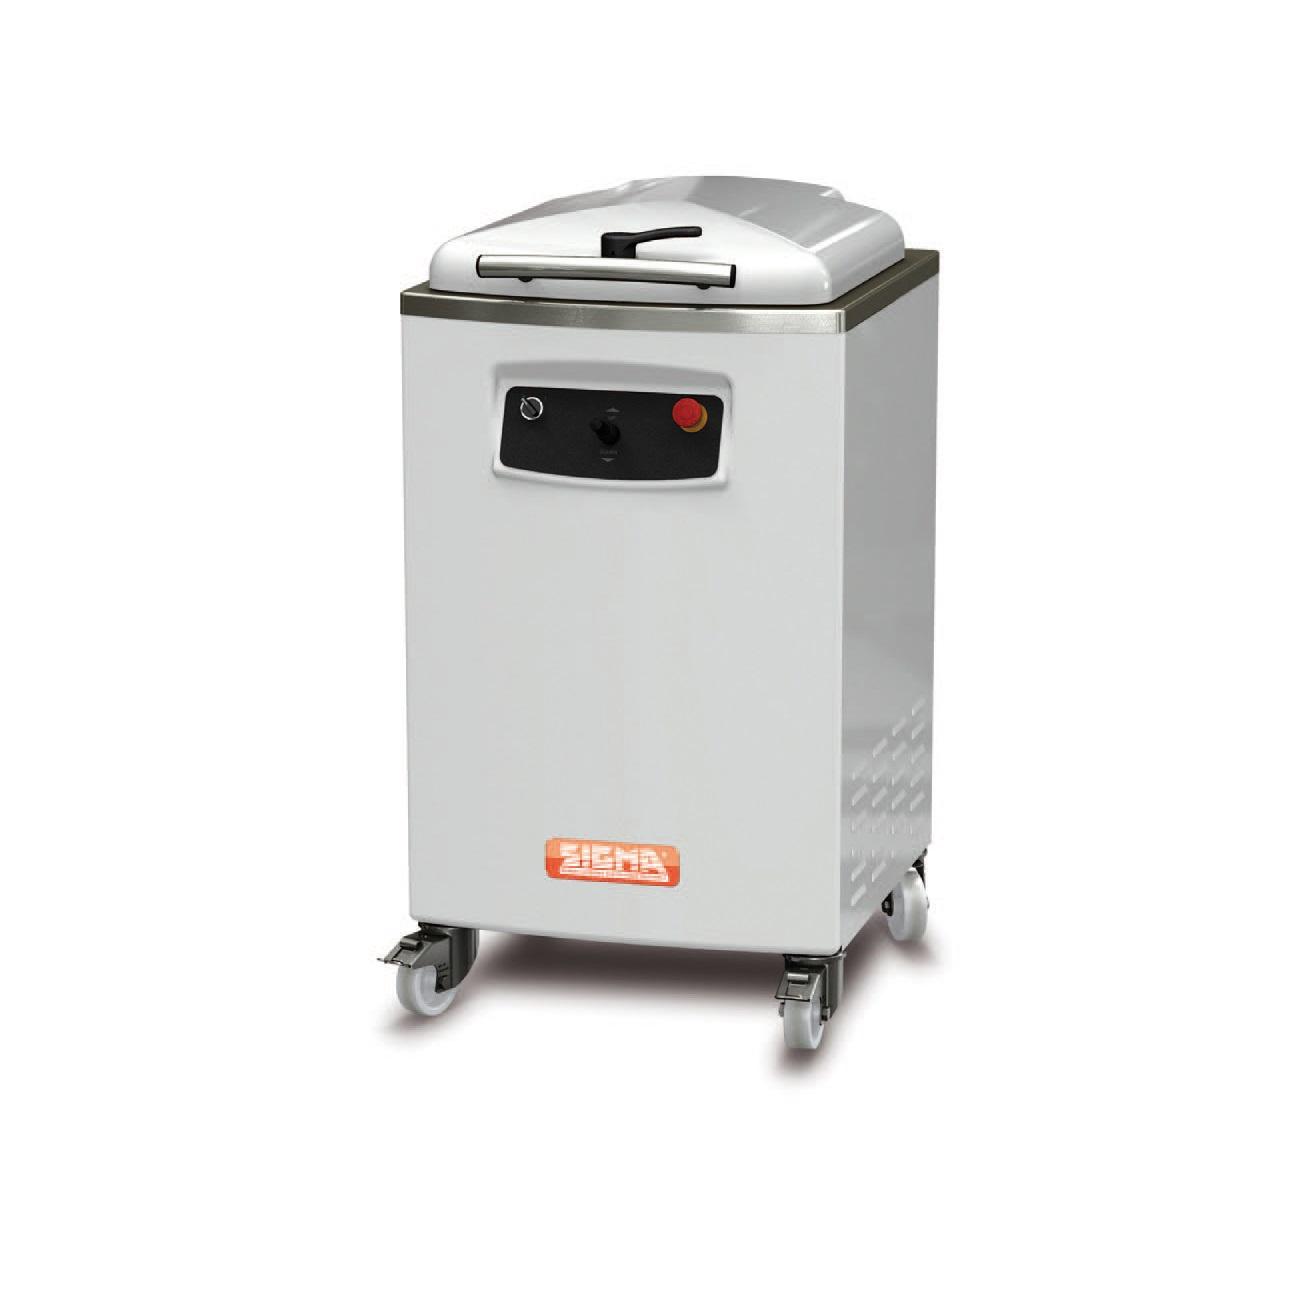 profesionalna-pekarska-oprema-mcs-4